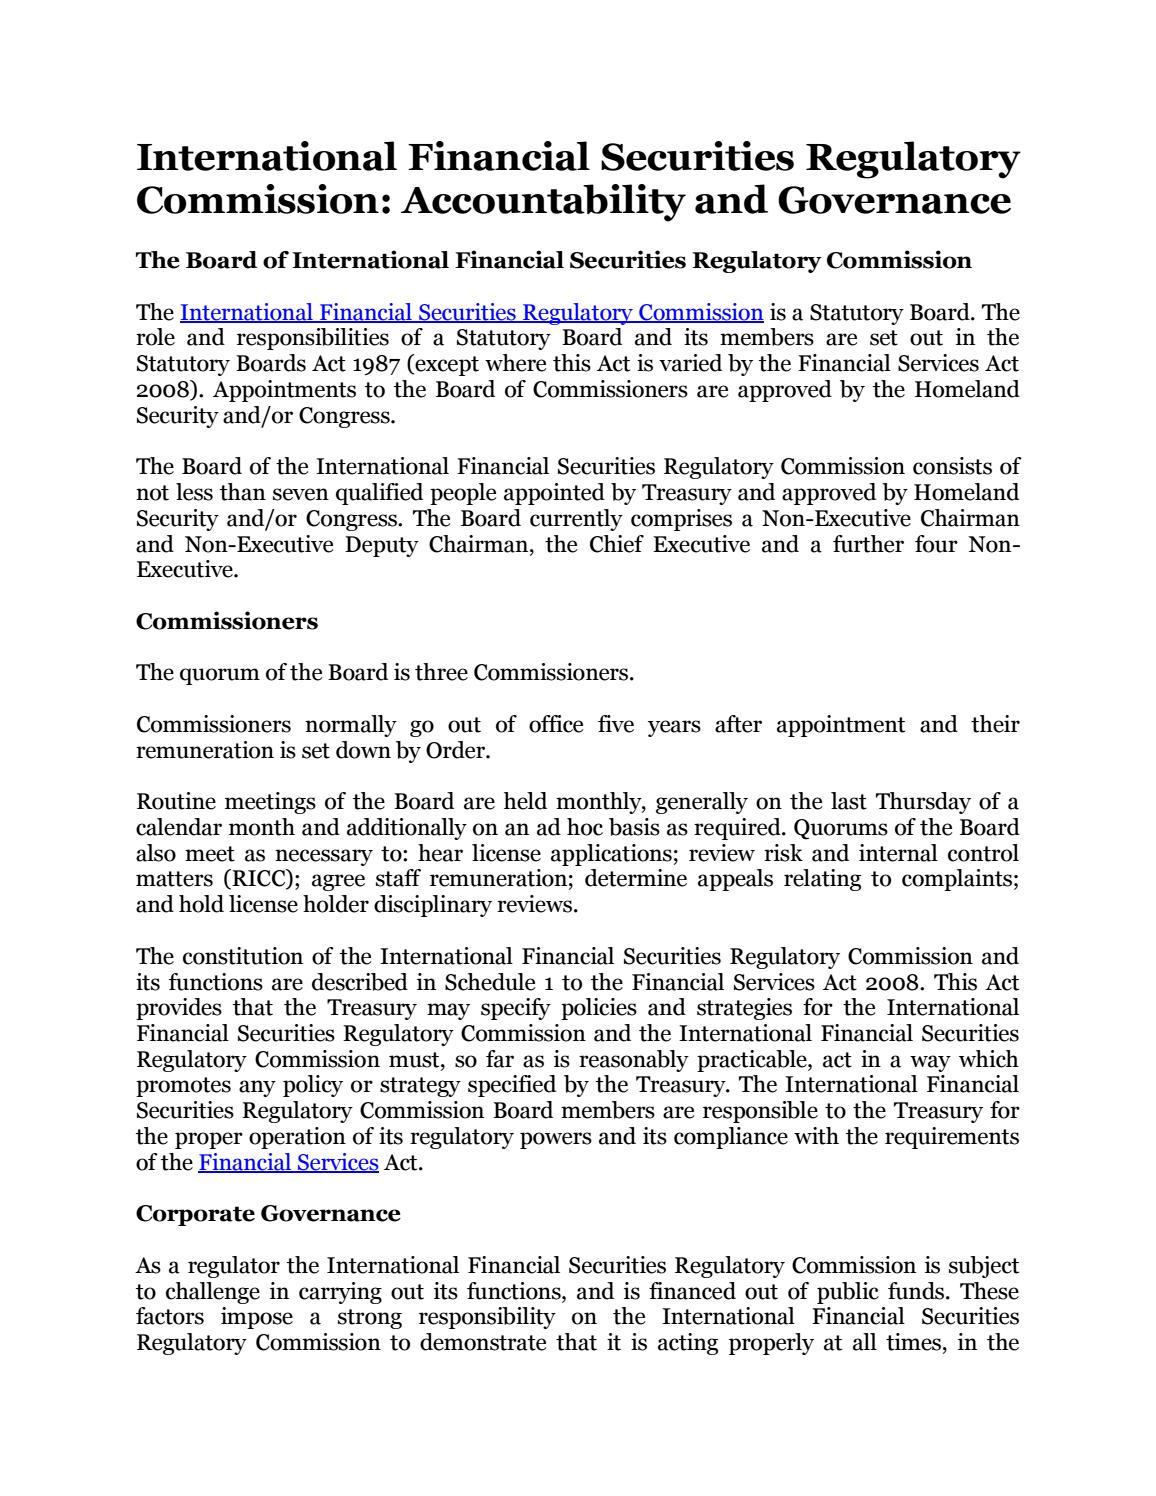 International Financial Securities Regulatory Commission ...